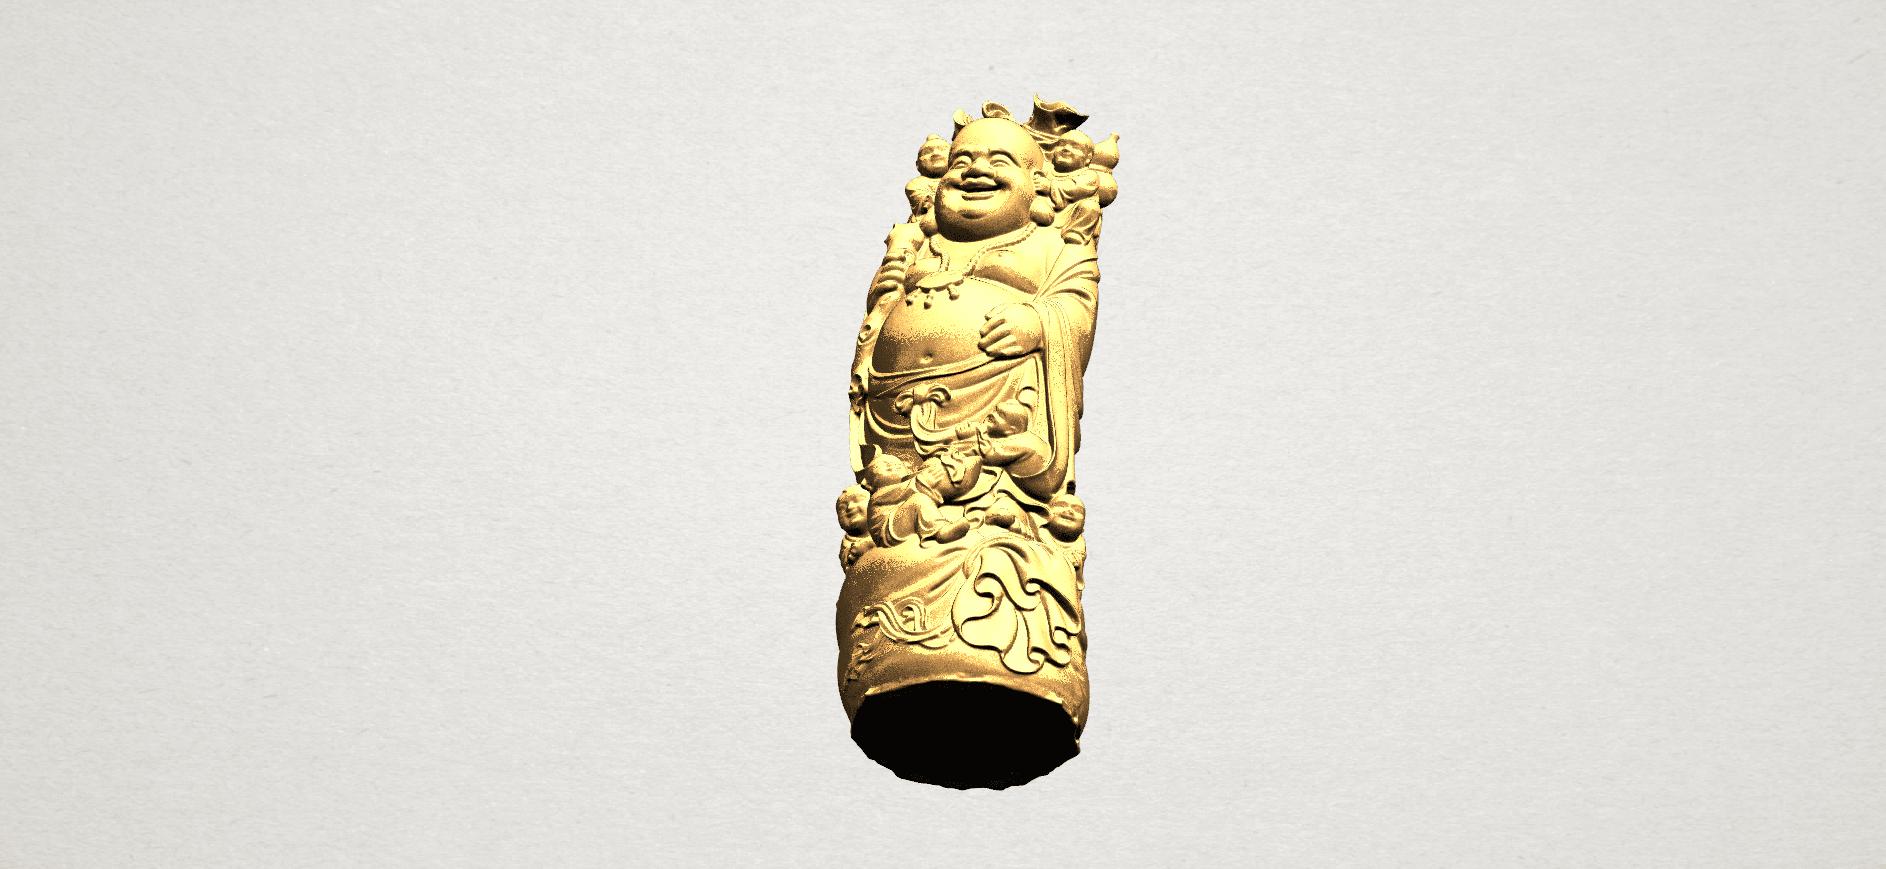 TDA0070 Metteyya Buddha 02 - 88mm - A10.png Download free STL file Metteyya Buddha 02 • 3D printer object, GeorgesNikkei